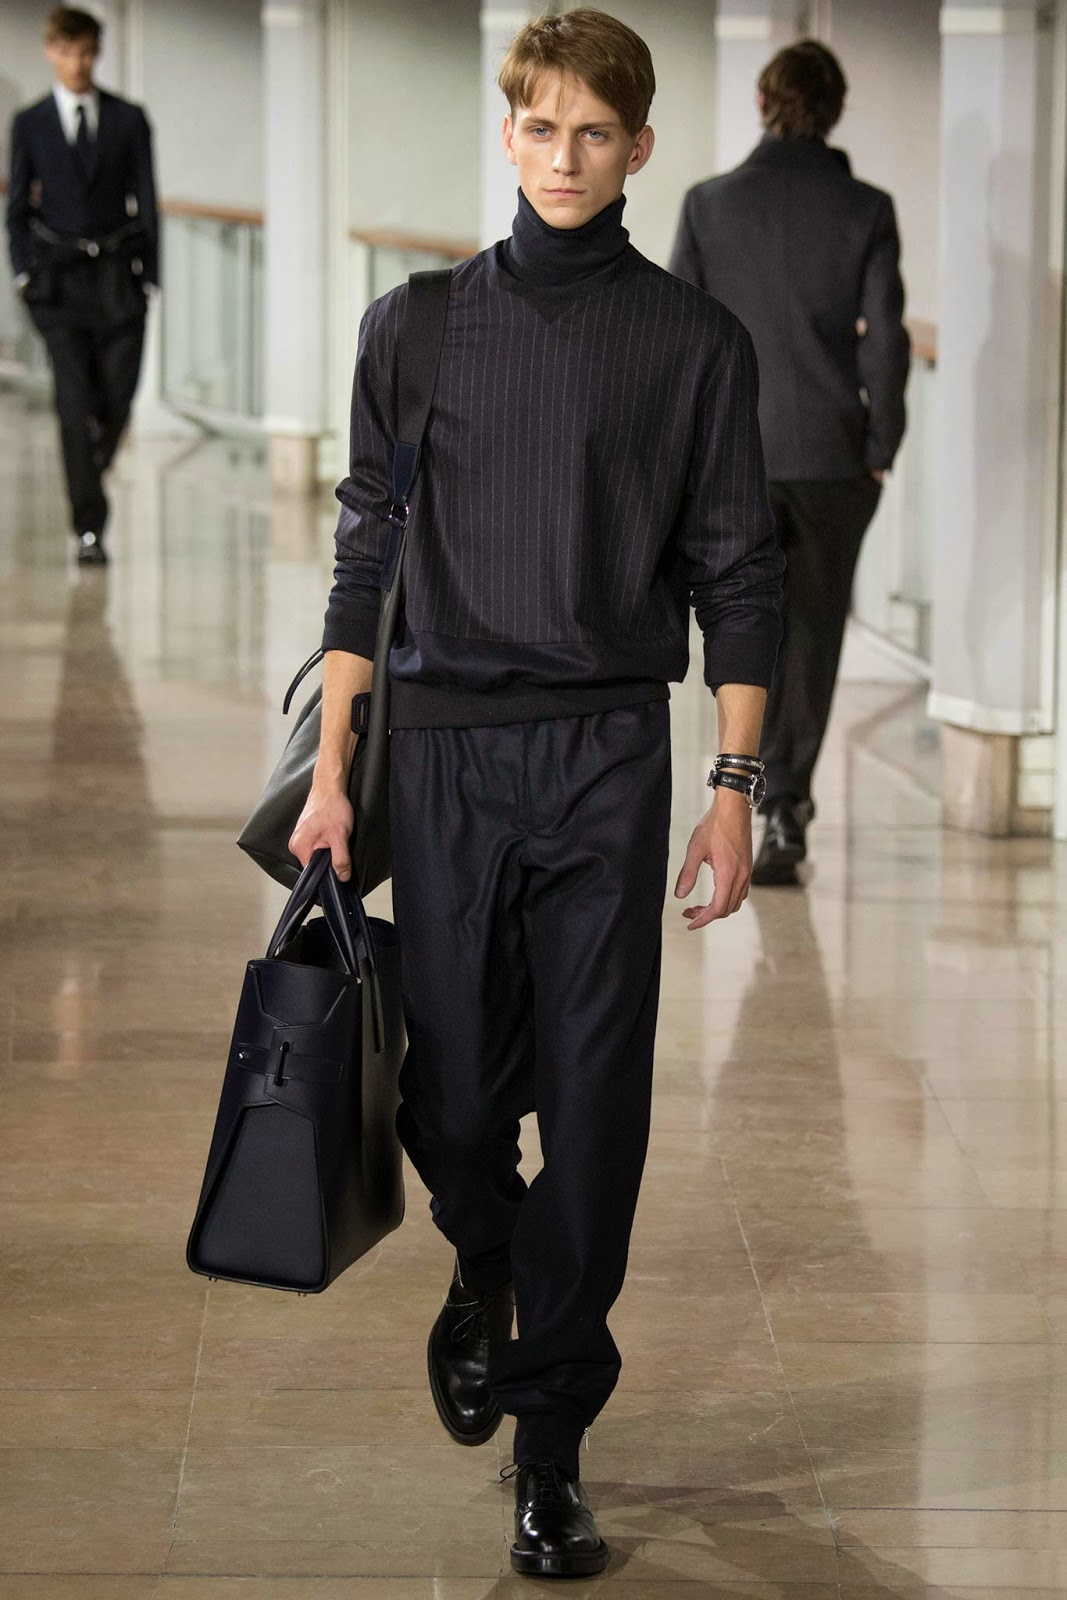 77a5c82f6eb5 FASHION BY THE RULES  Hermès by Véronique Nichanian.. fall 2015 men s